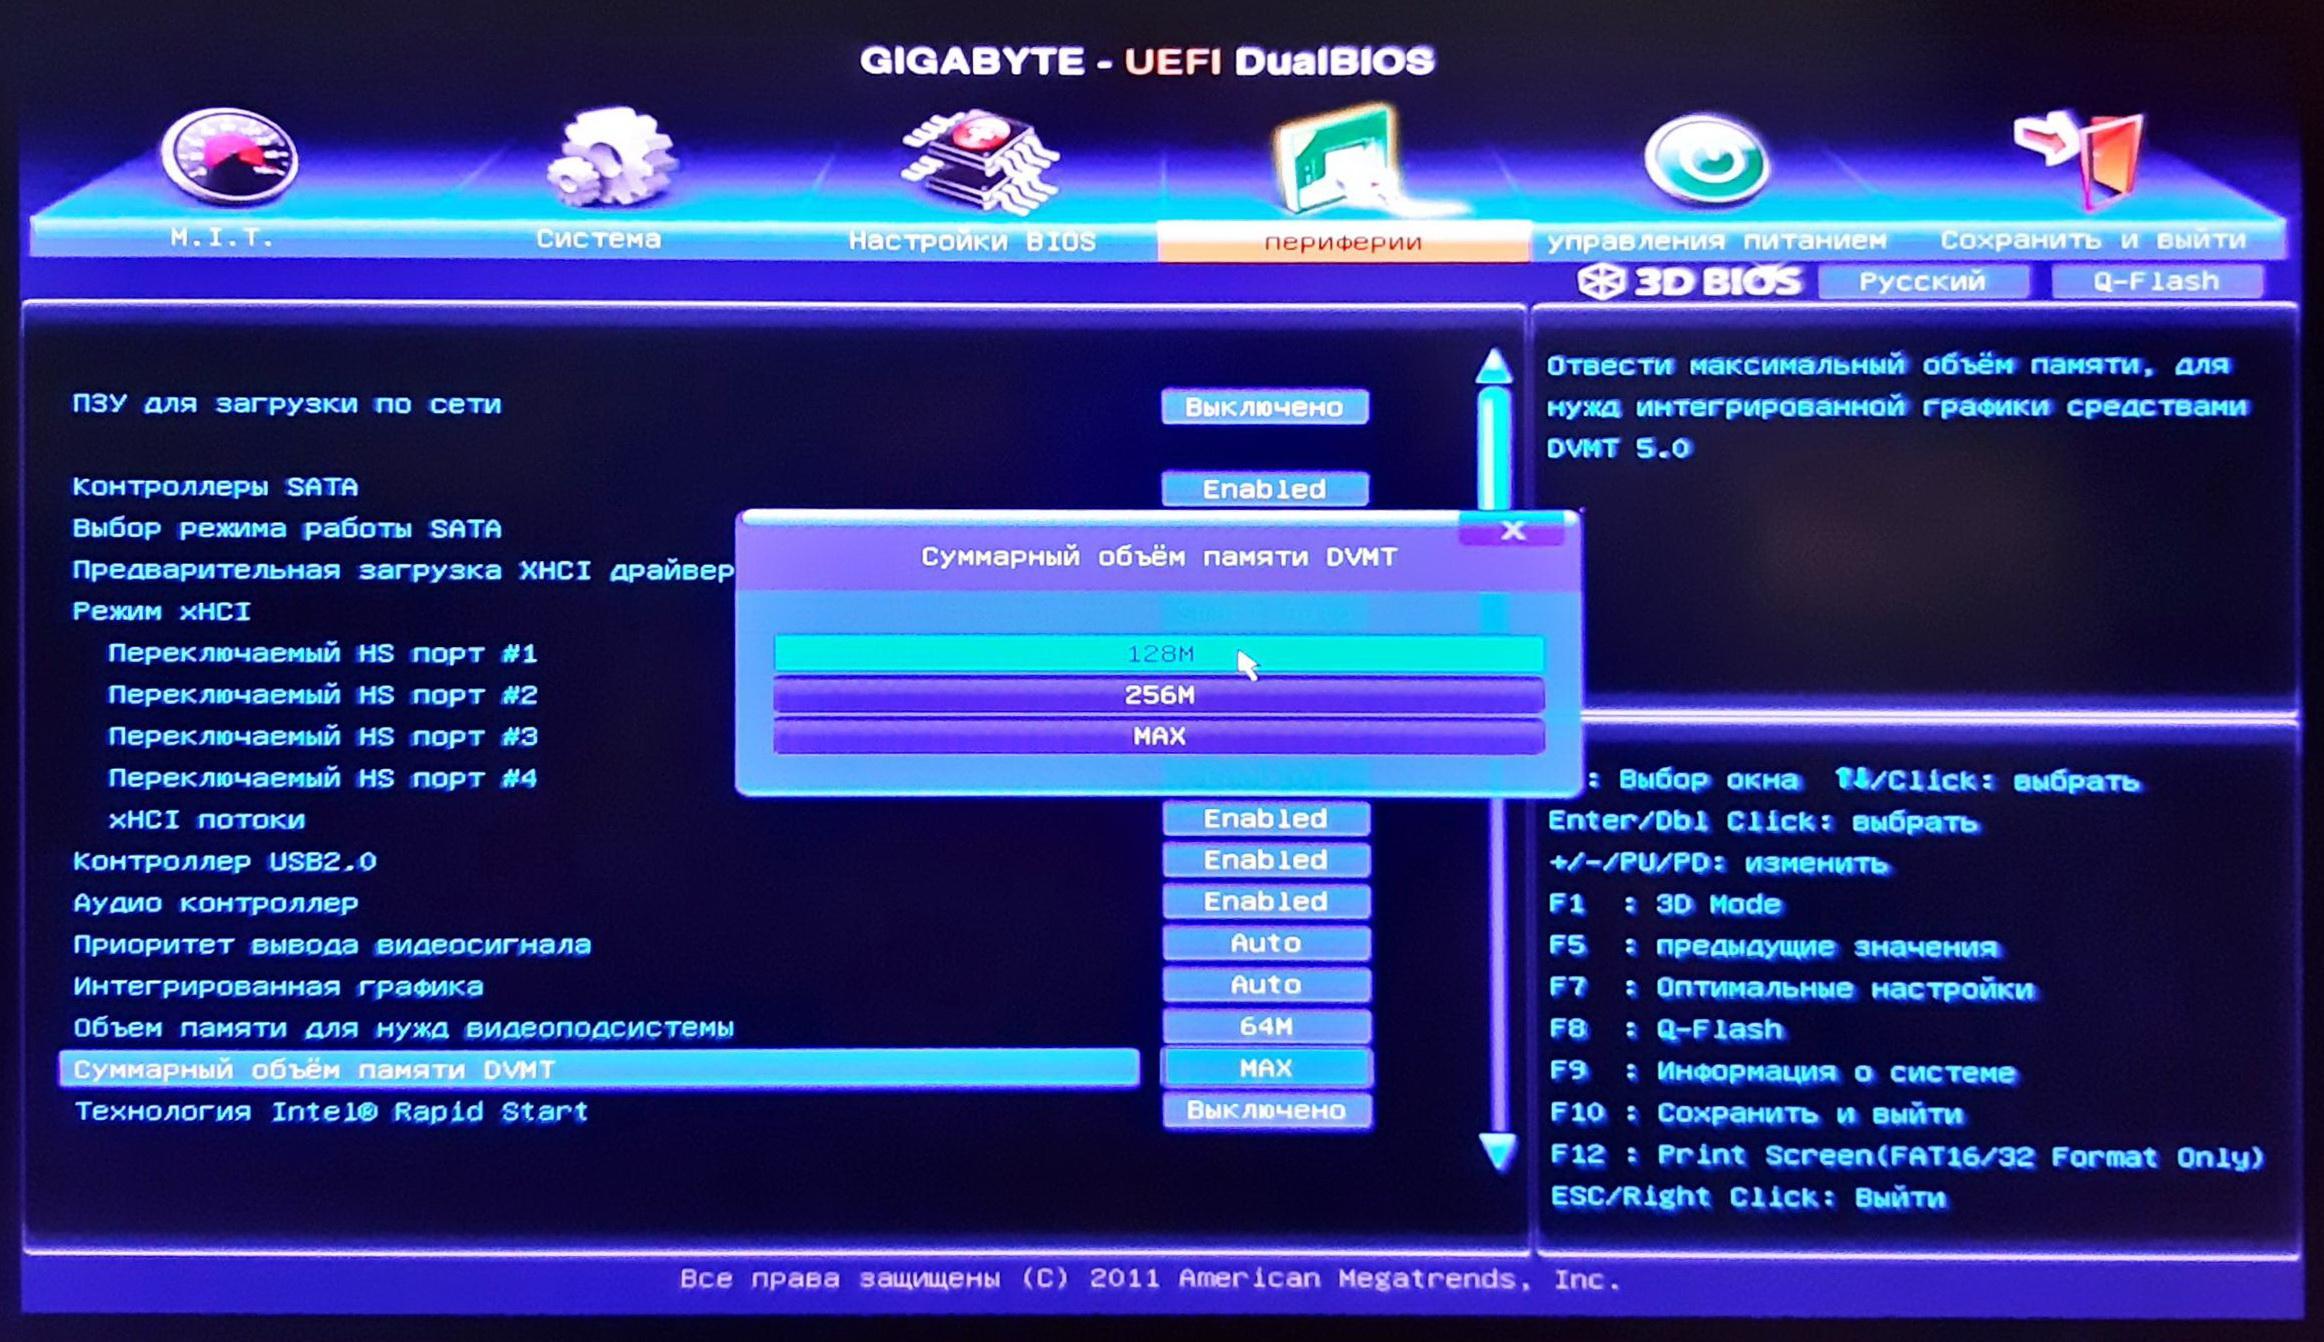 Суммарный объем памяти DVMT в UEFI